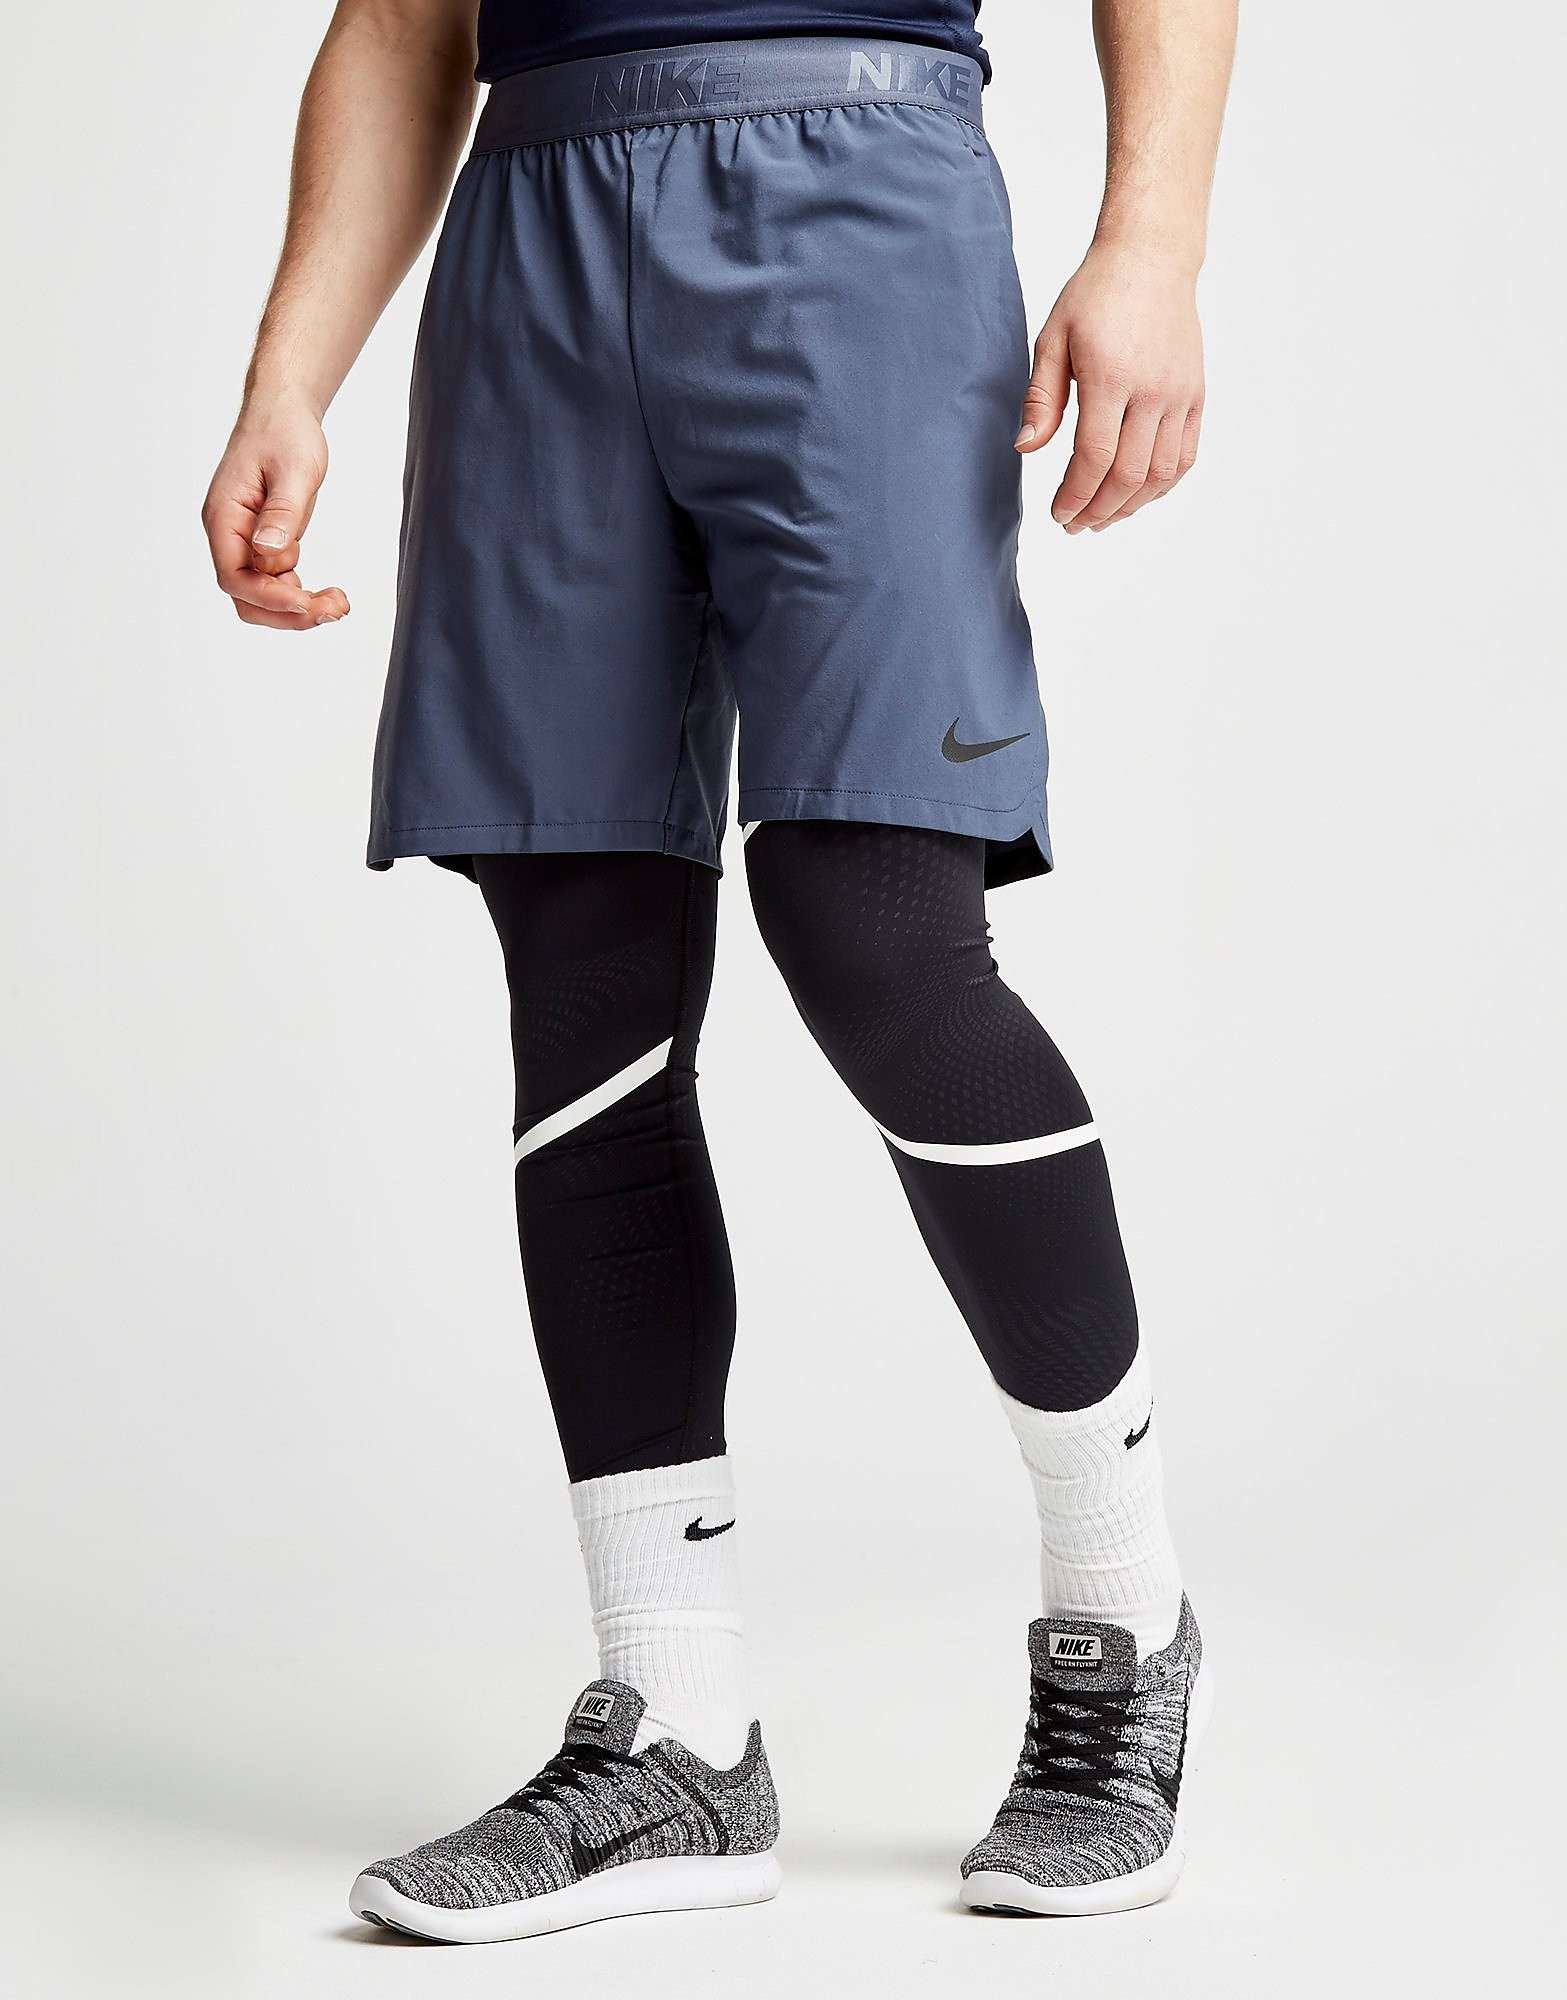 Nike Flex Vented Shorts 2.0